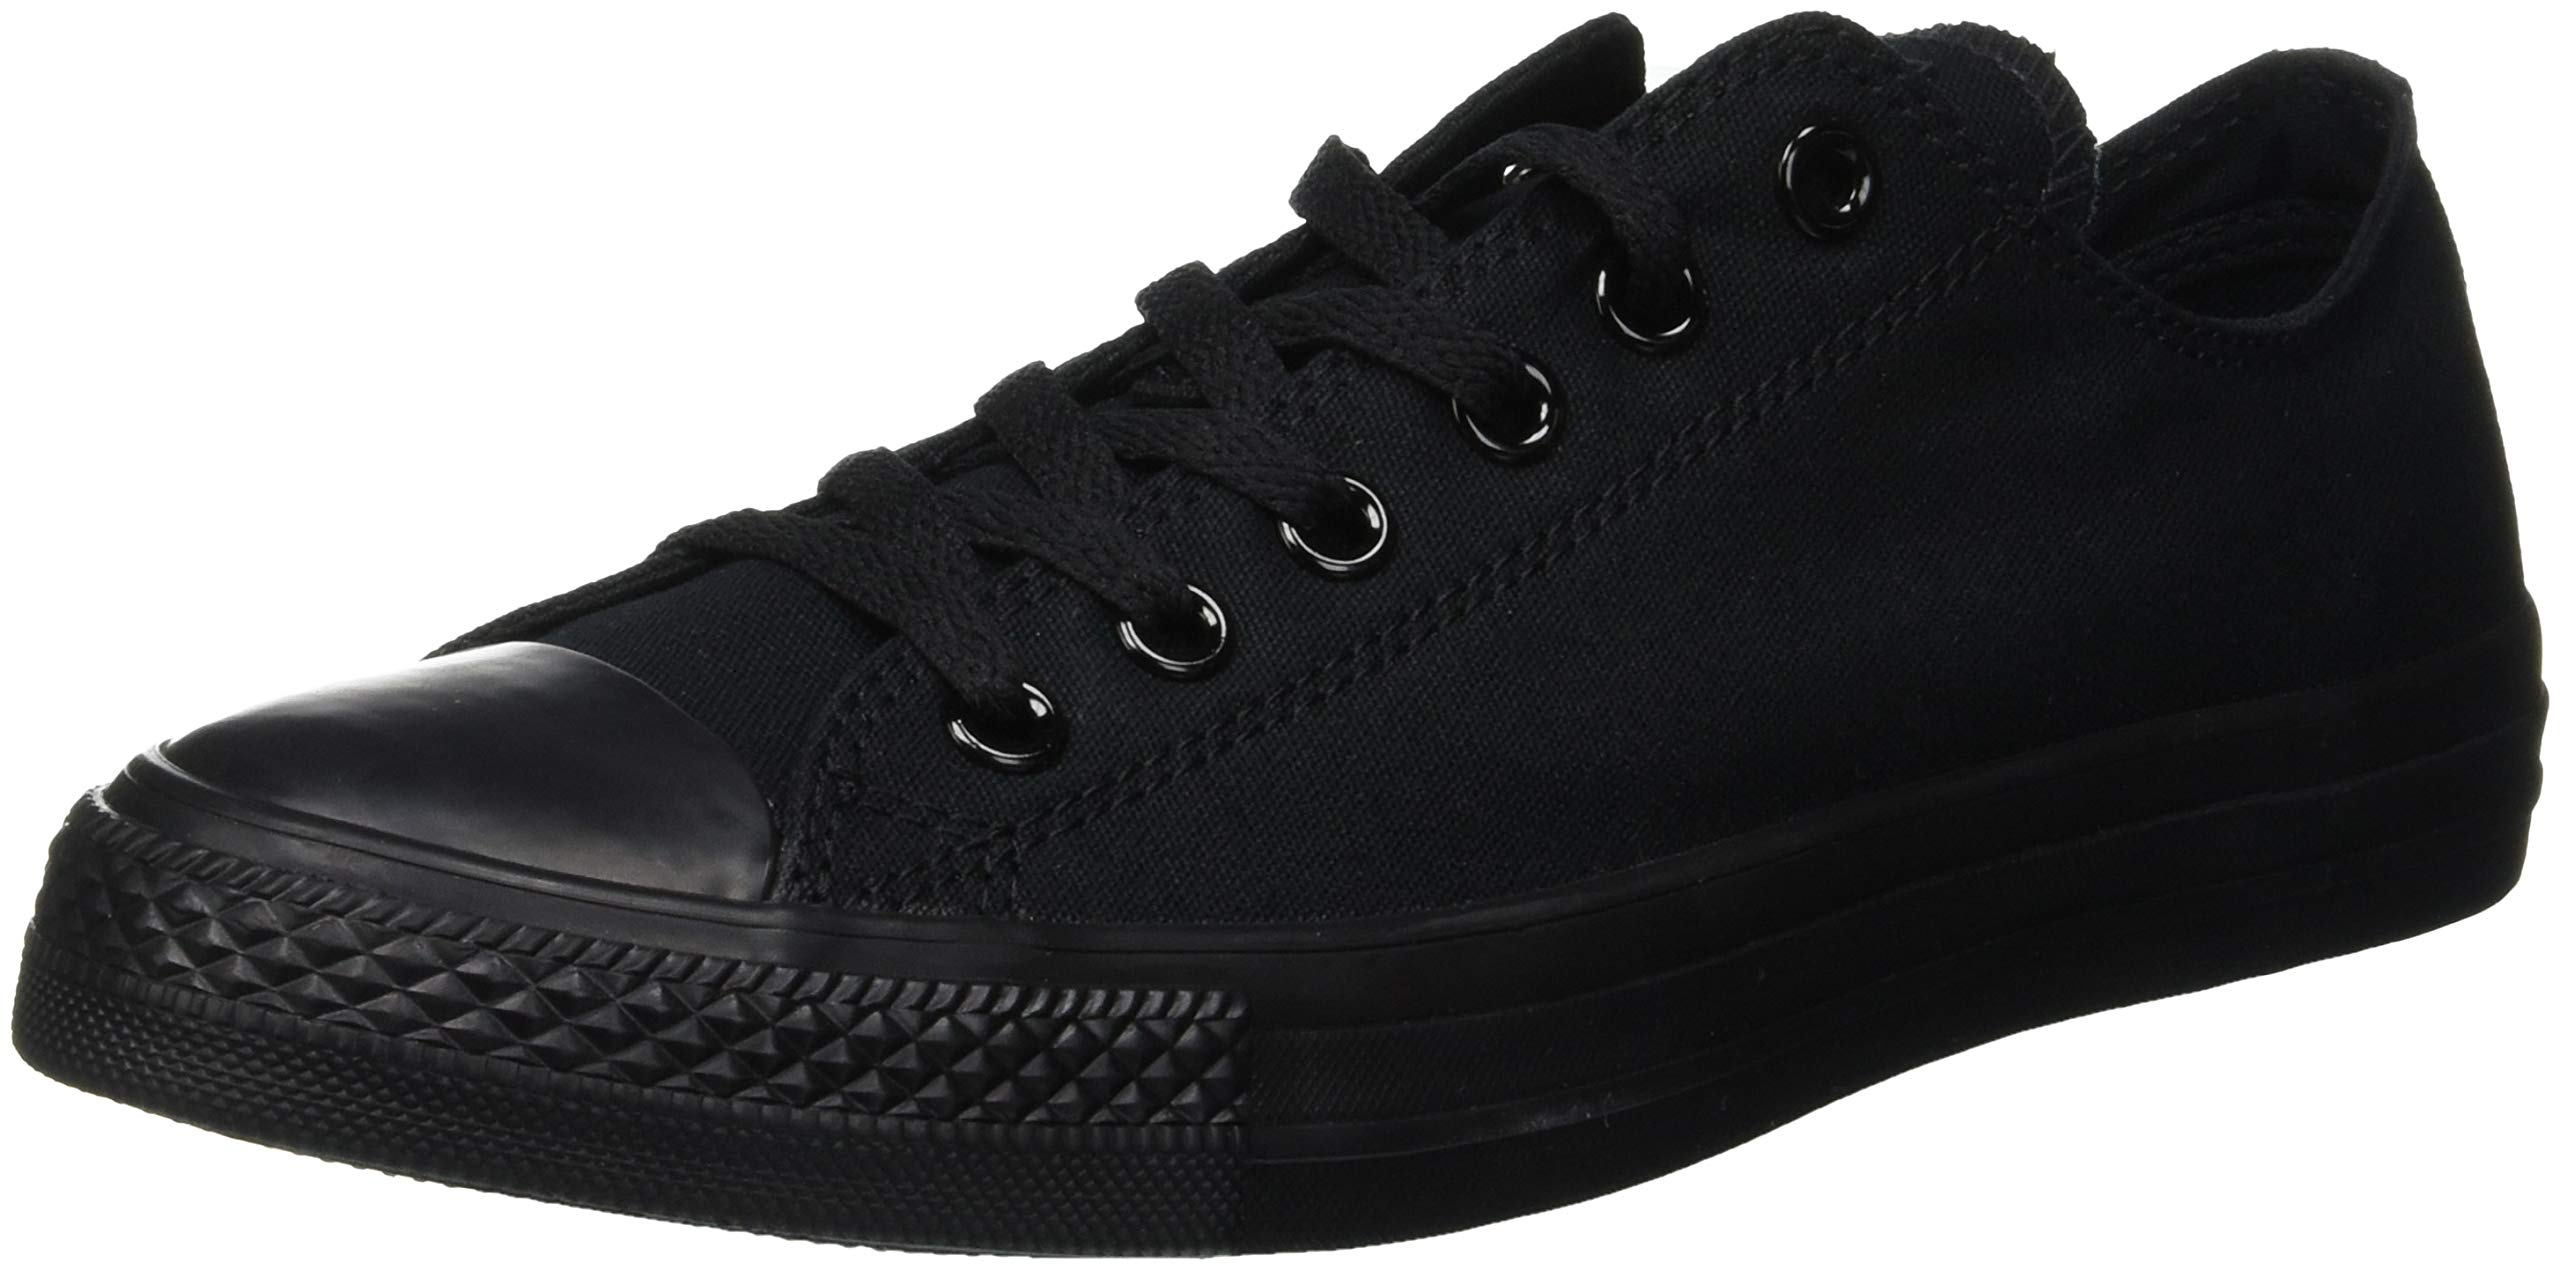 Converse Unisex Chuck Taylor All Star Low Top Black Monochrome Sneakers - 11 B(M) US Women / 9 D(M) US Men